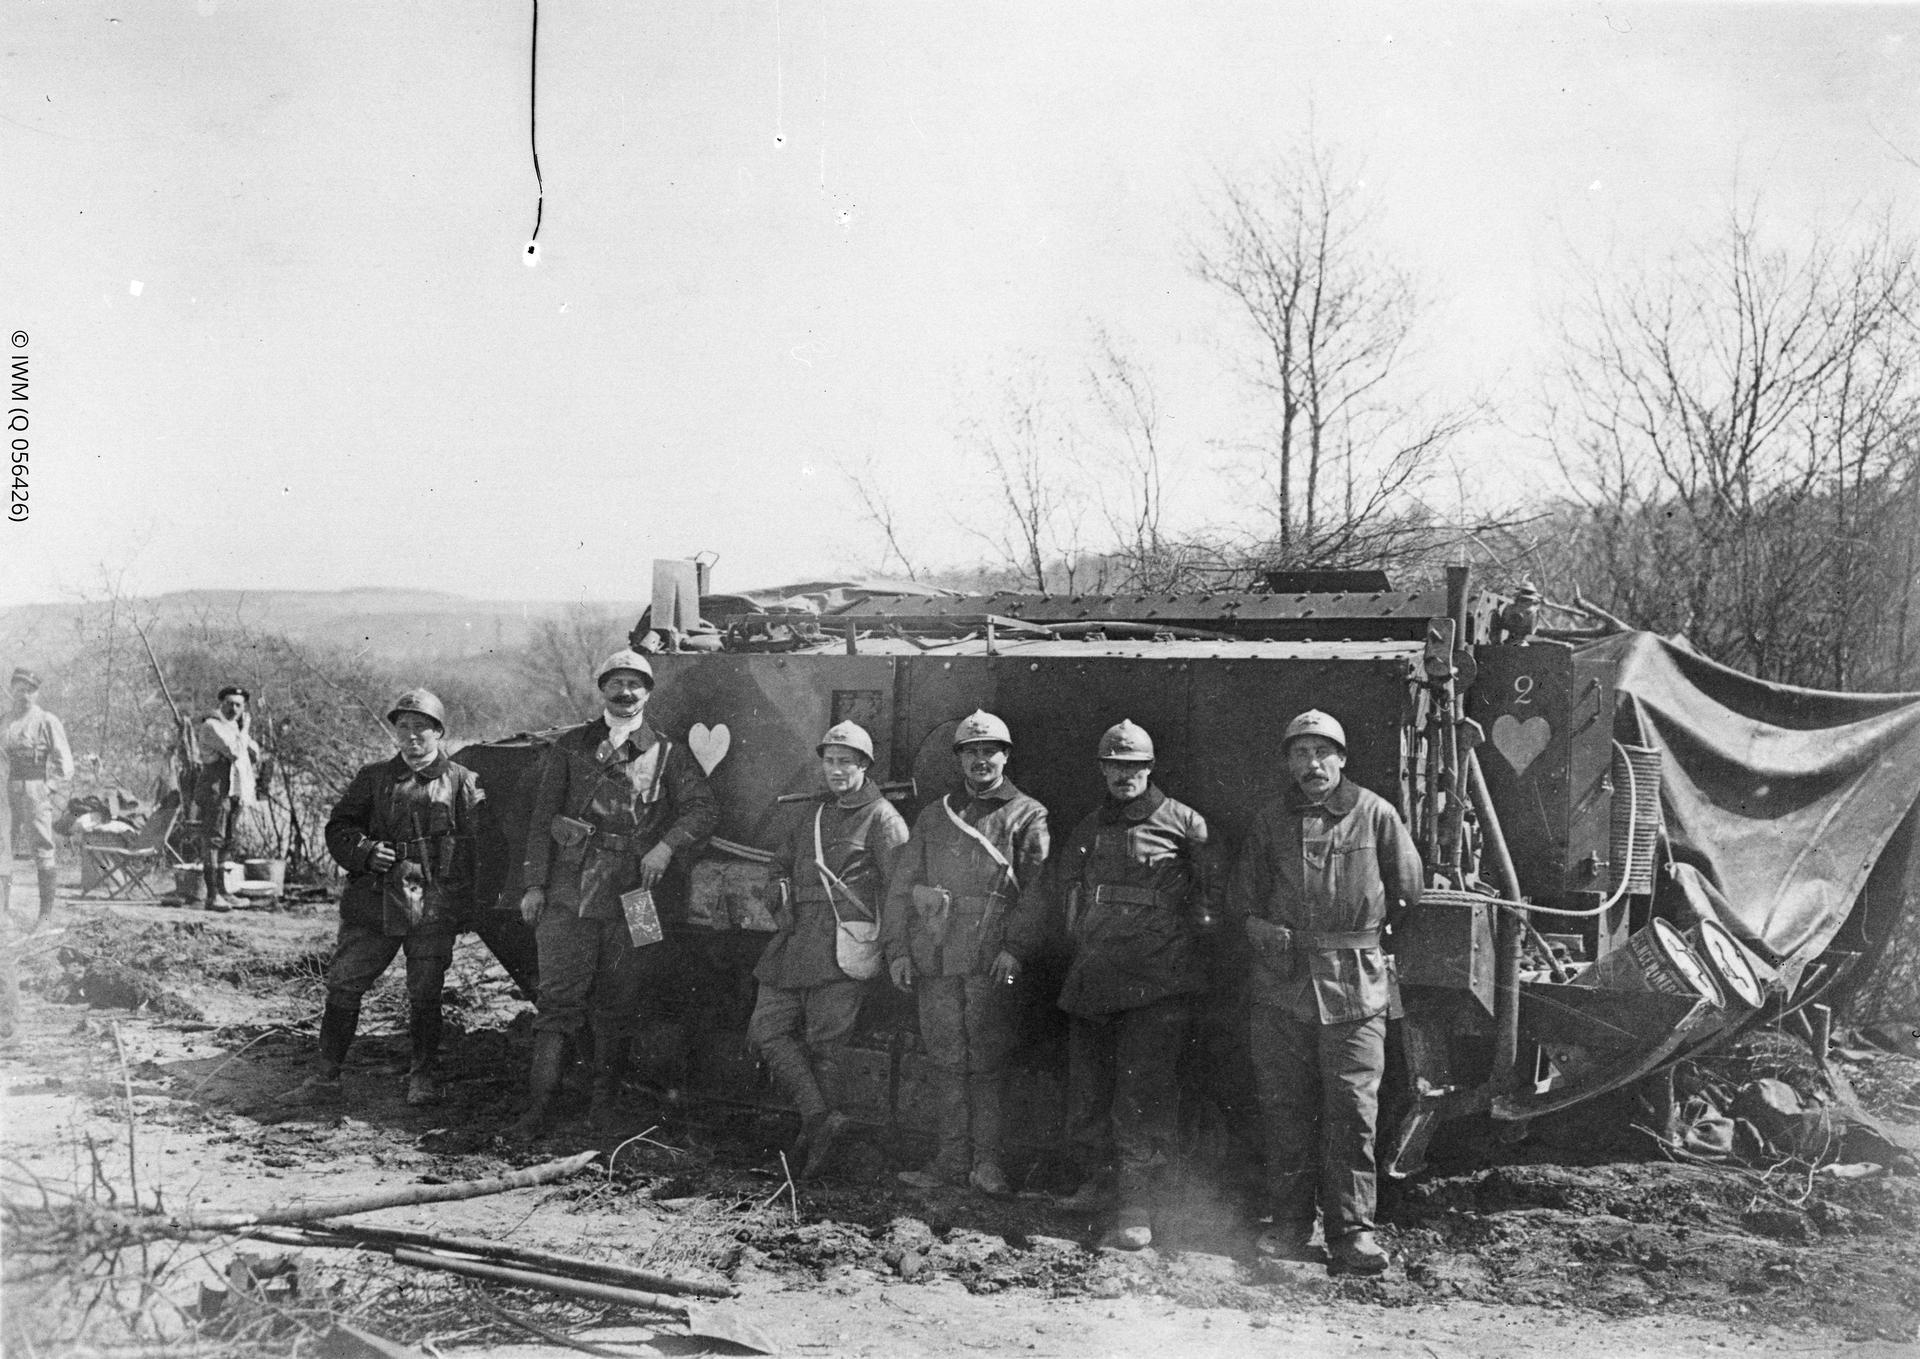 Photograph of Schneidertank and crew, Maizy, Aisne, France.